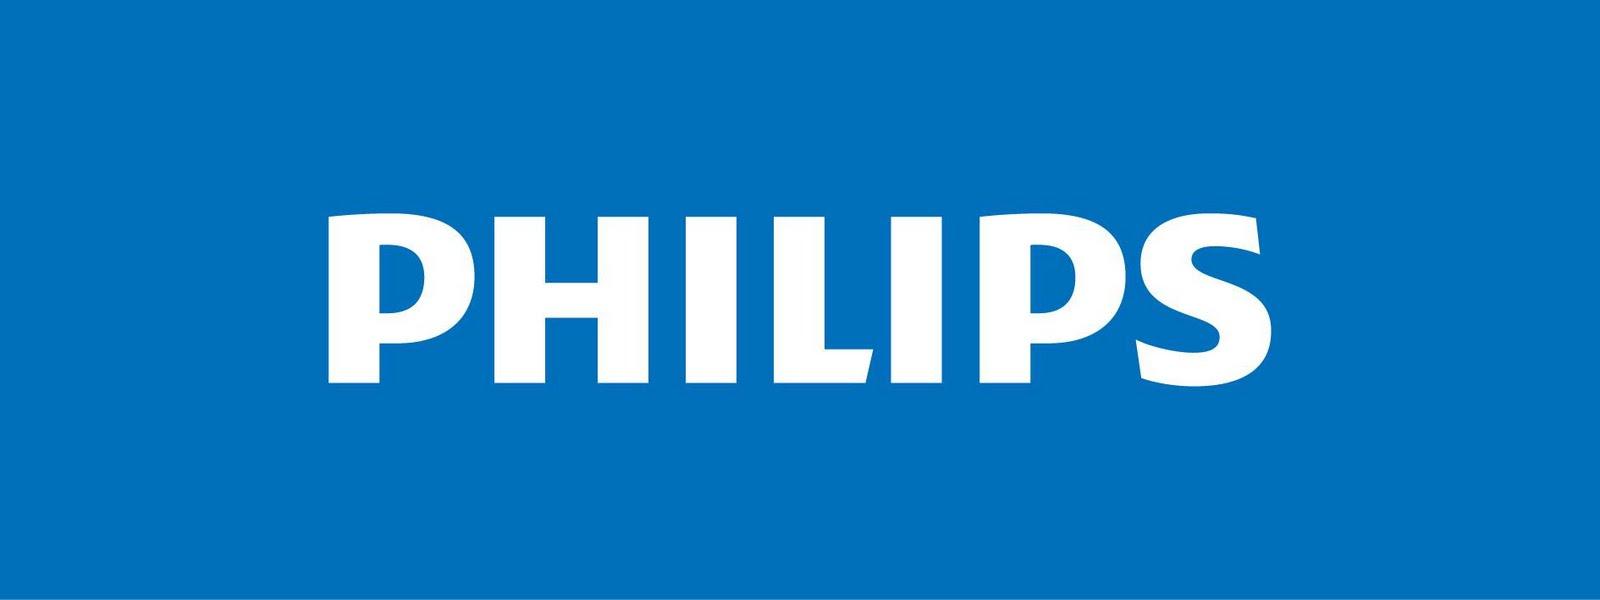 Philips_TS-Quality